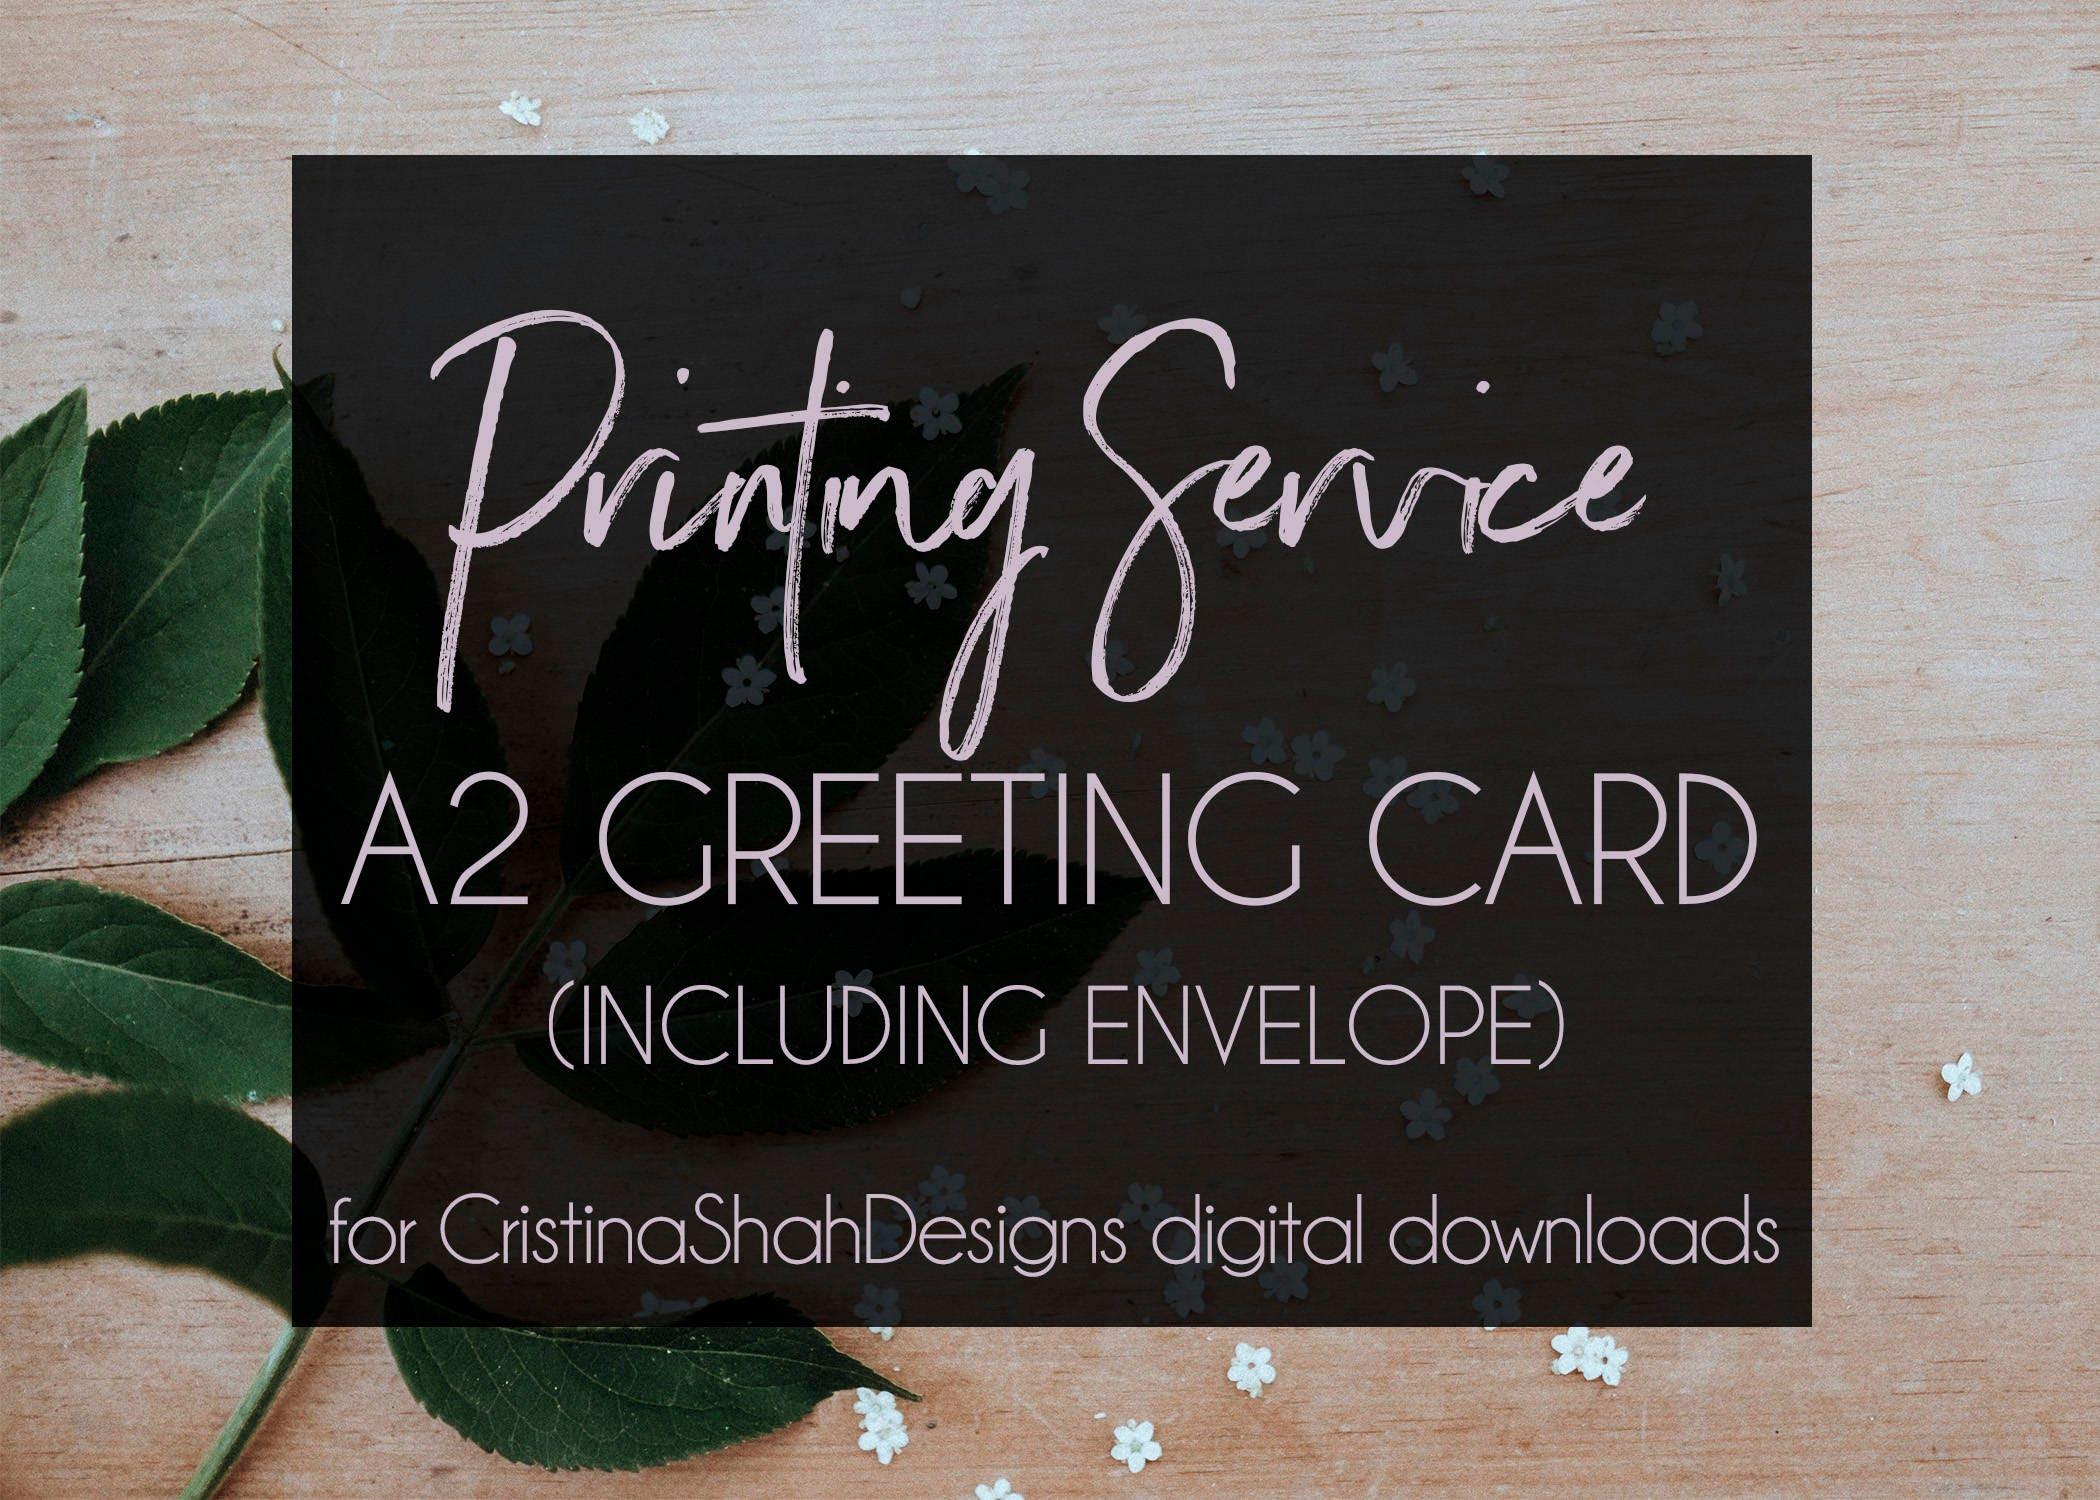 Printing Service A2 55 X 425 Greeting Card